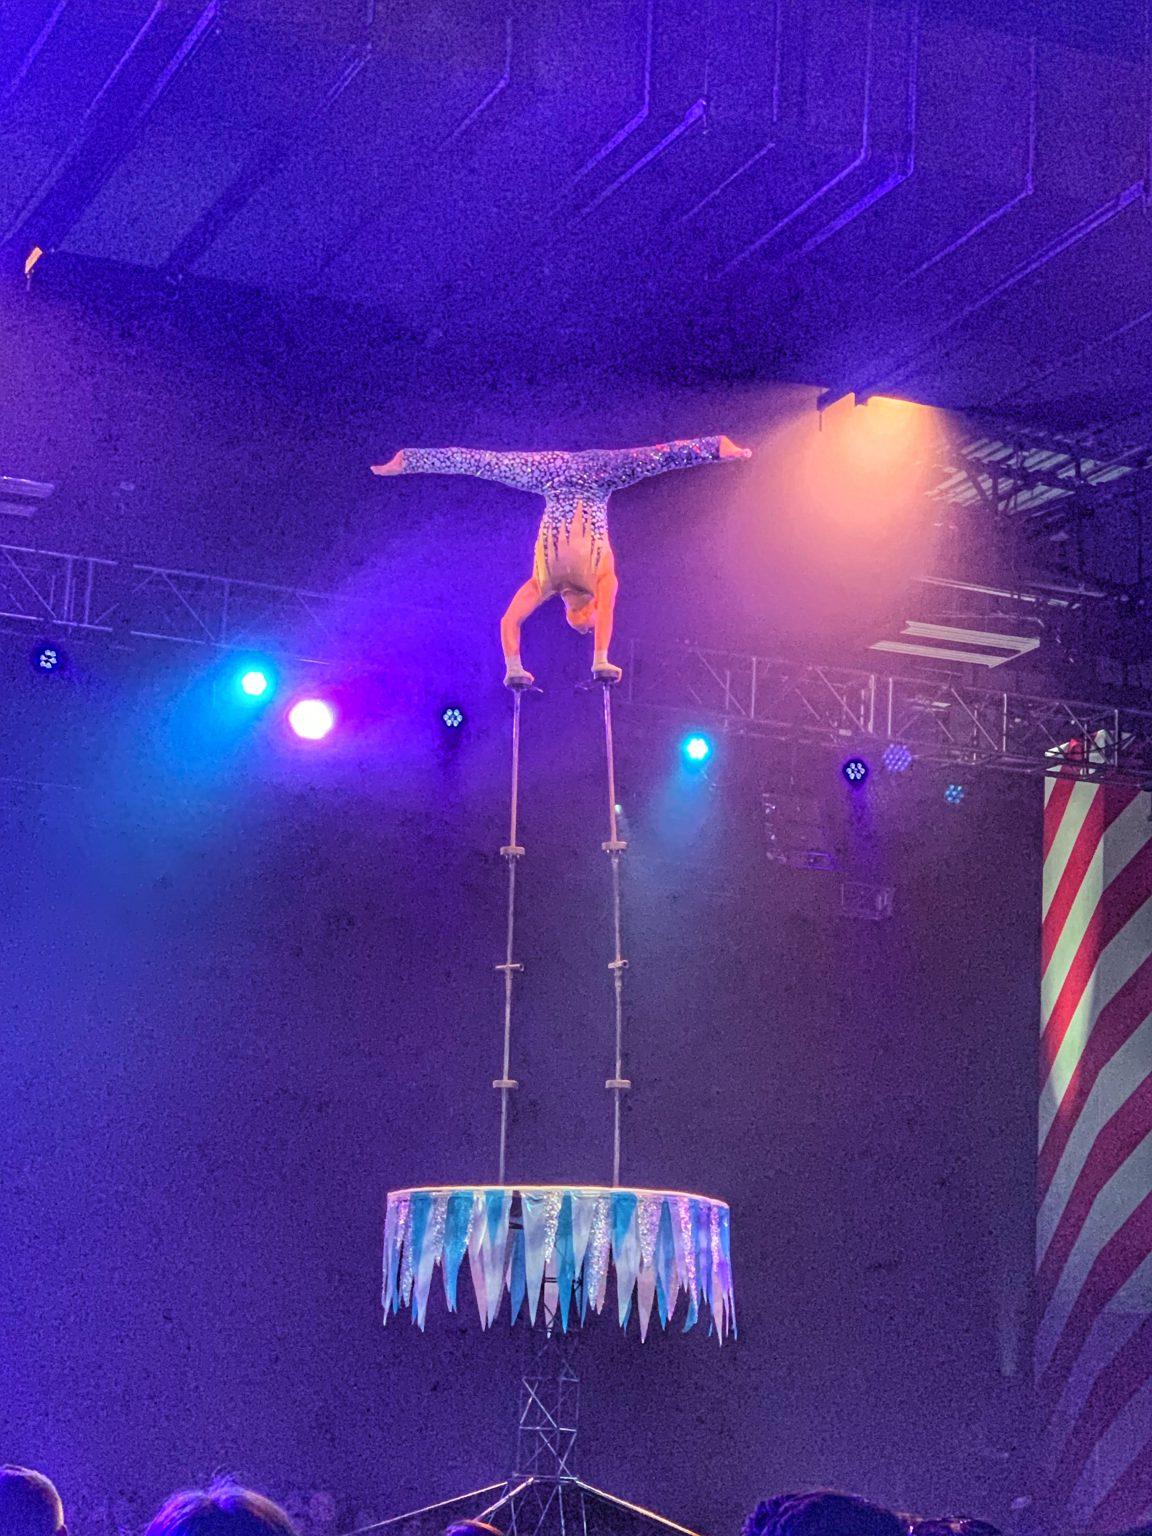 Chen Lei balances upside down on tall poles